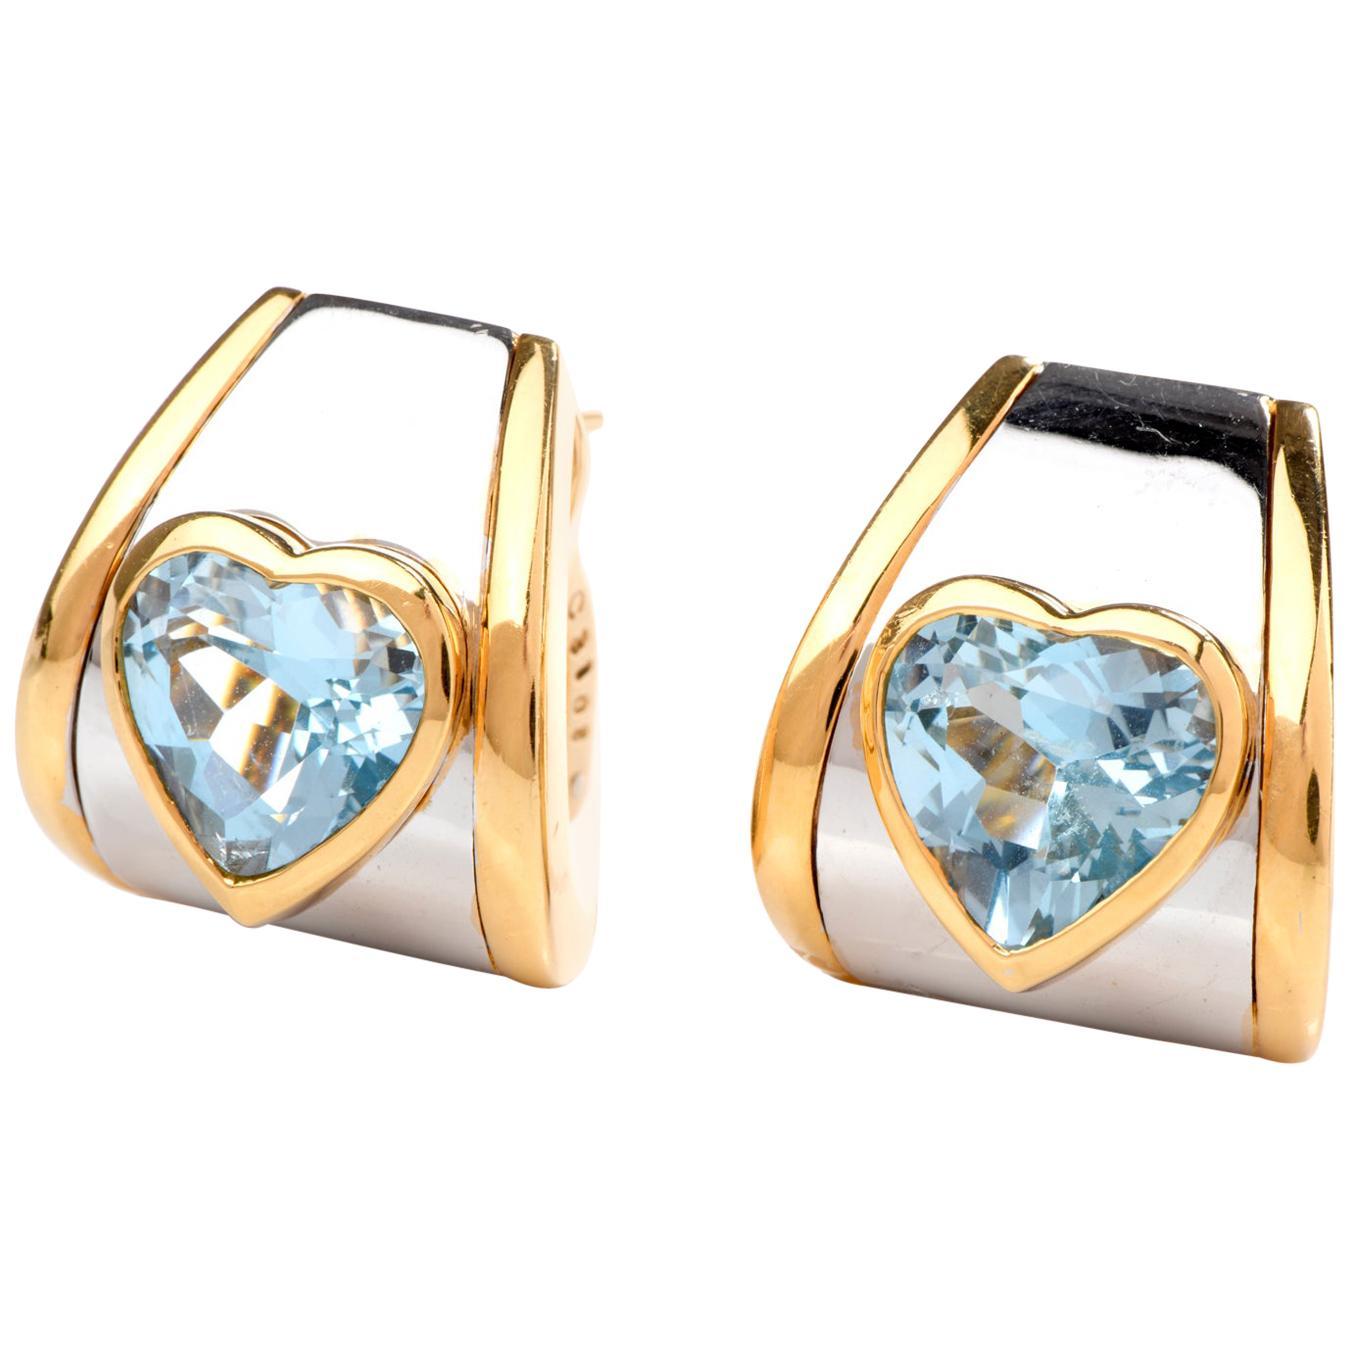 Marina B. Blue Topaz Heart 18 Karat Clip-On Earrings